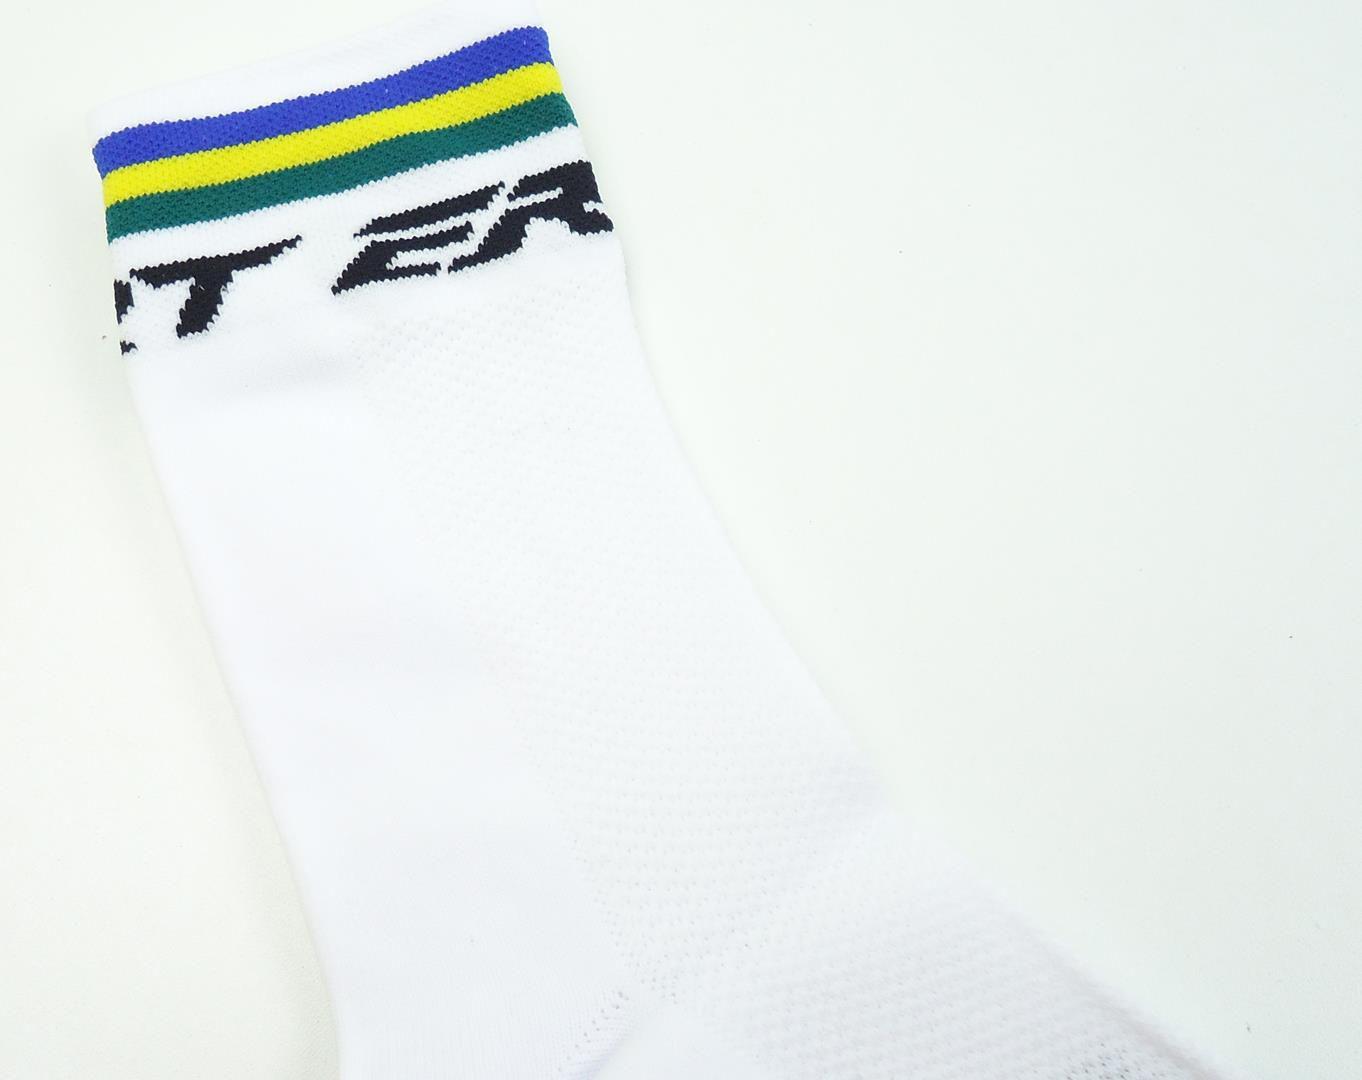 Meias para Ciclismo ERT Xtreme Cool Cores do Brasil MTB e Speed